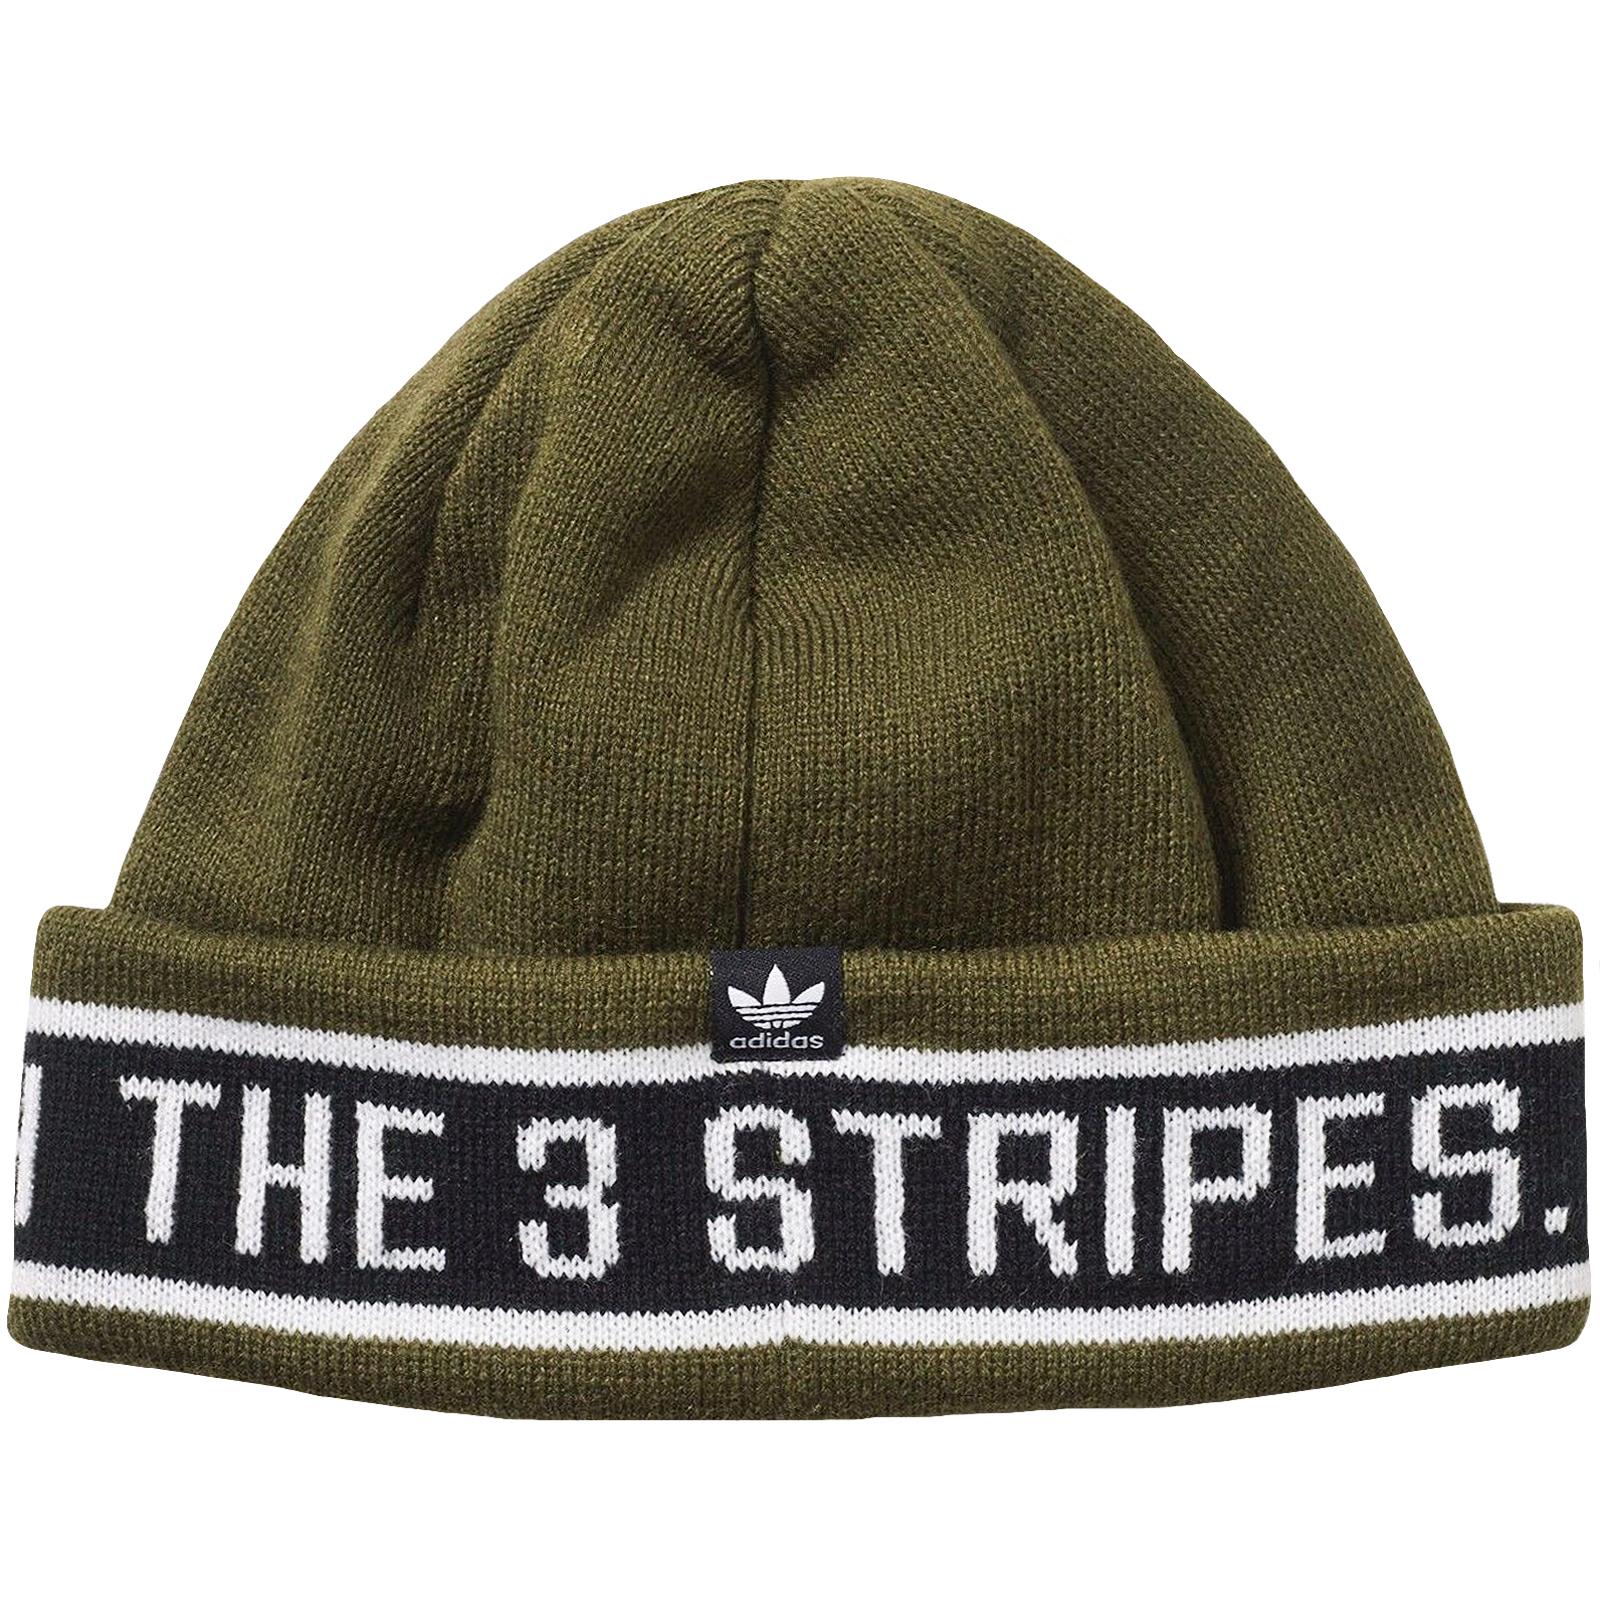 Details about adidas Originals Womens Rib Logo 3 Stripes Knit Beanie Hat -  Green - One Size fd63b20ef